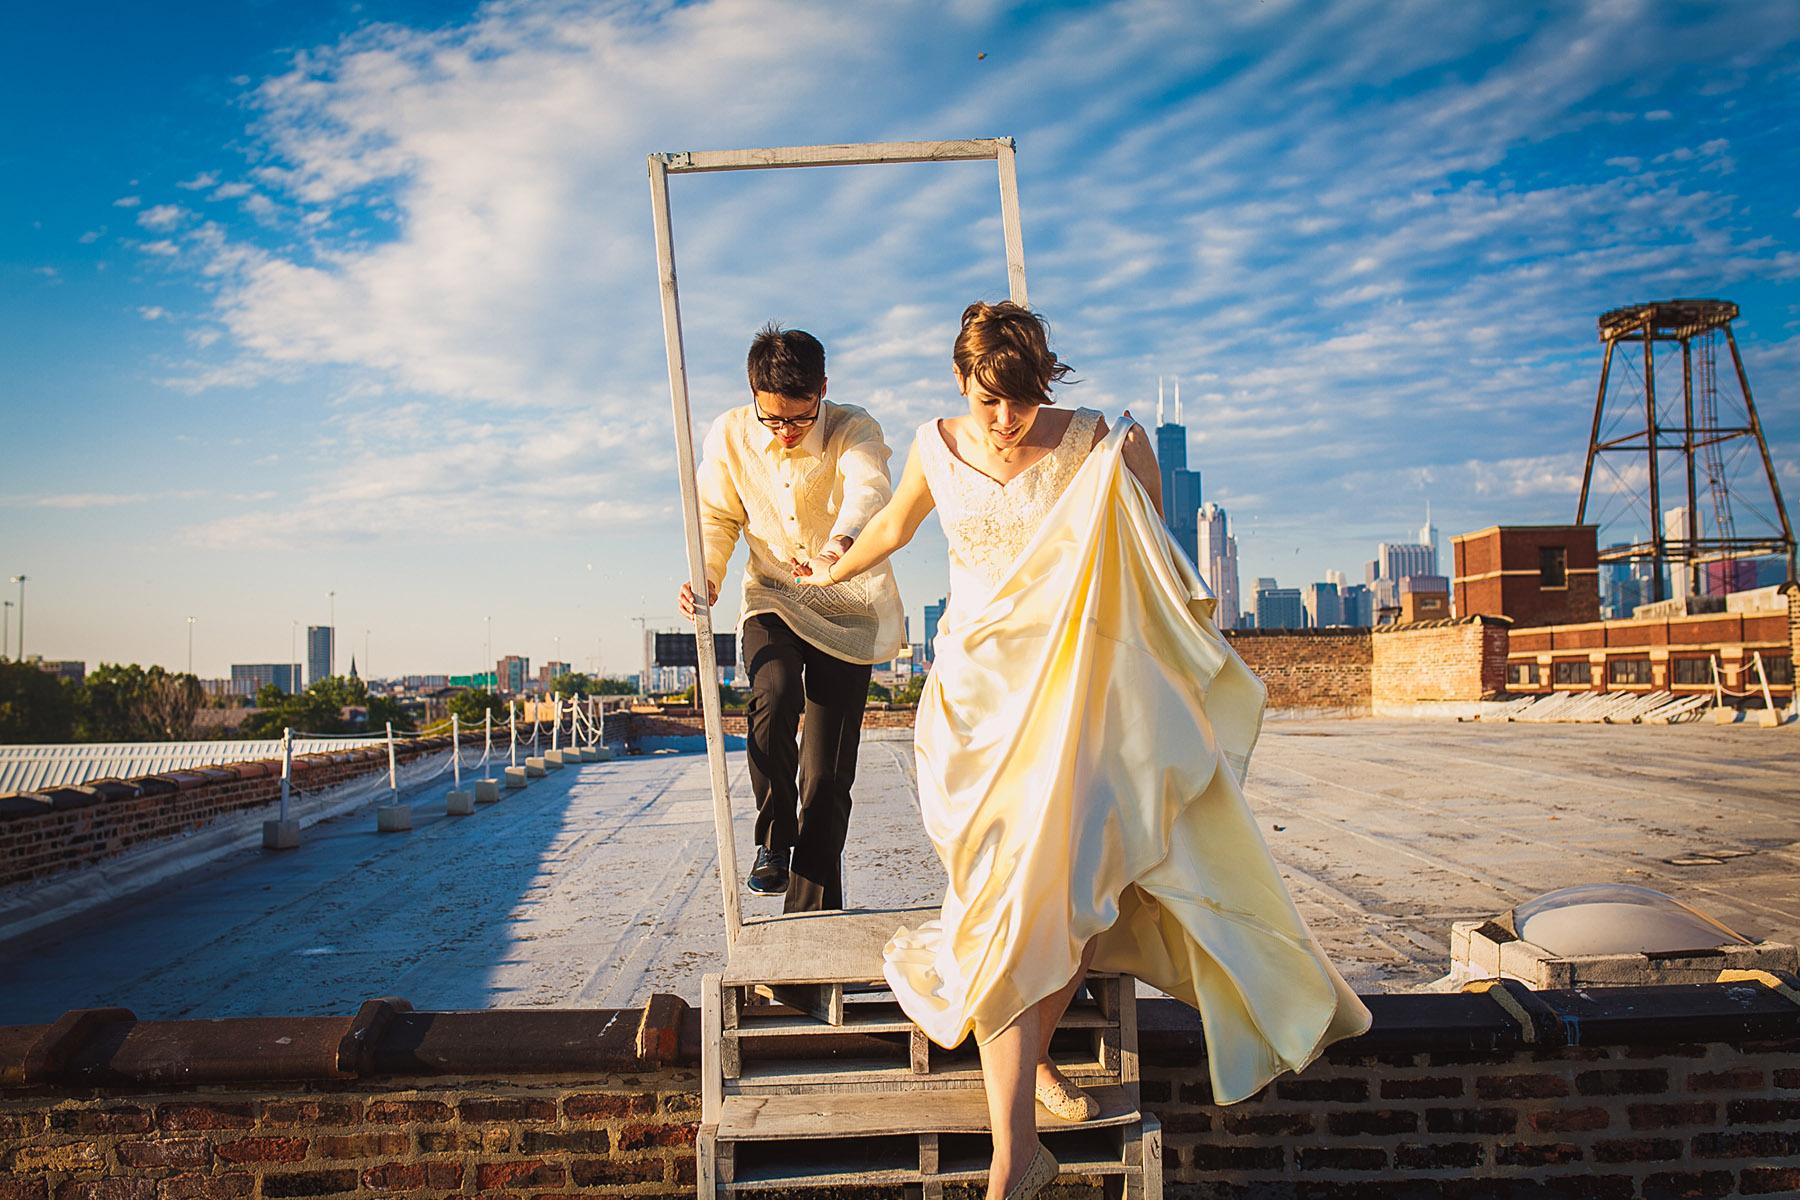 st-hegwig-chicago-urban-arts-society-terrarium-inspired-wedding-documentary-wedding-photography-oriana-koren-55.jpg